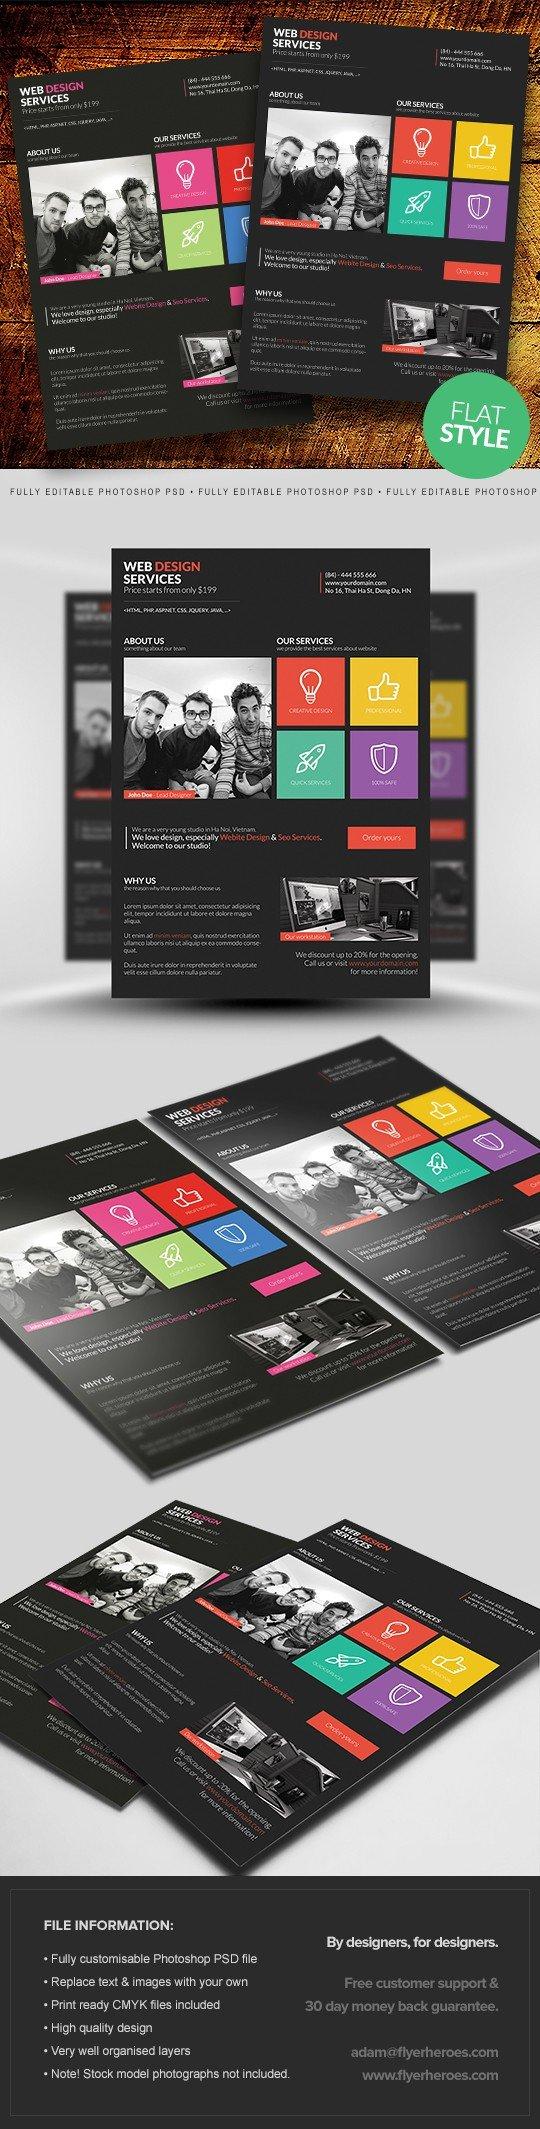 Metro Style Web Design Flyer Template